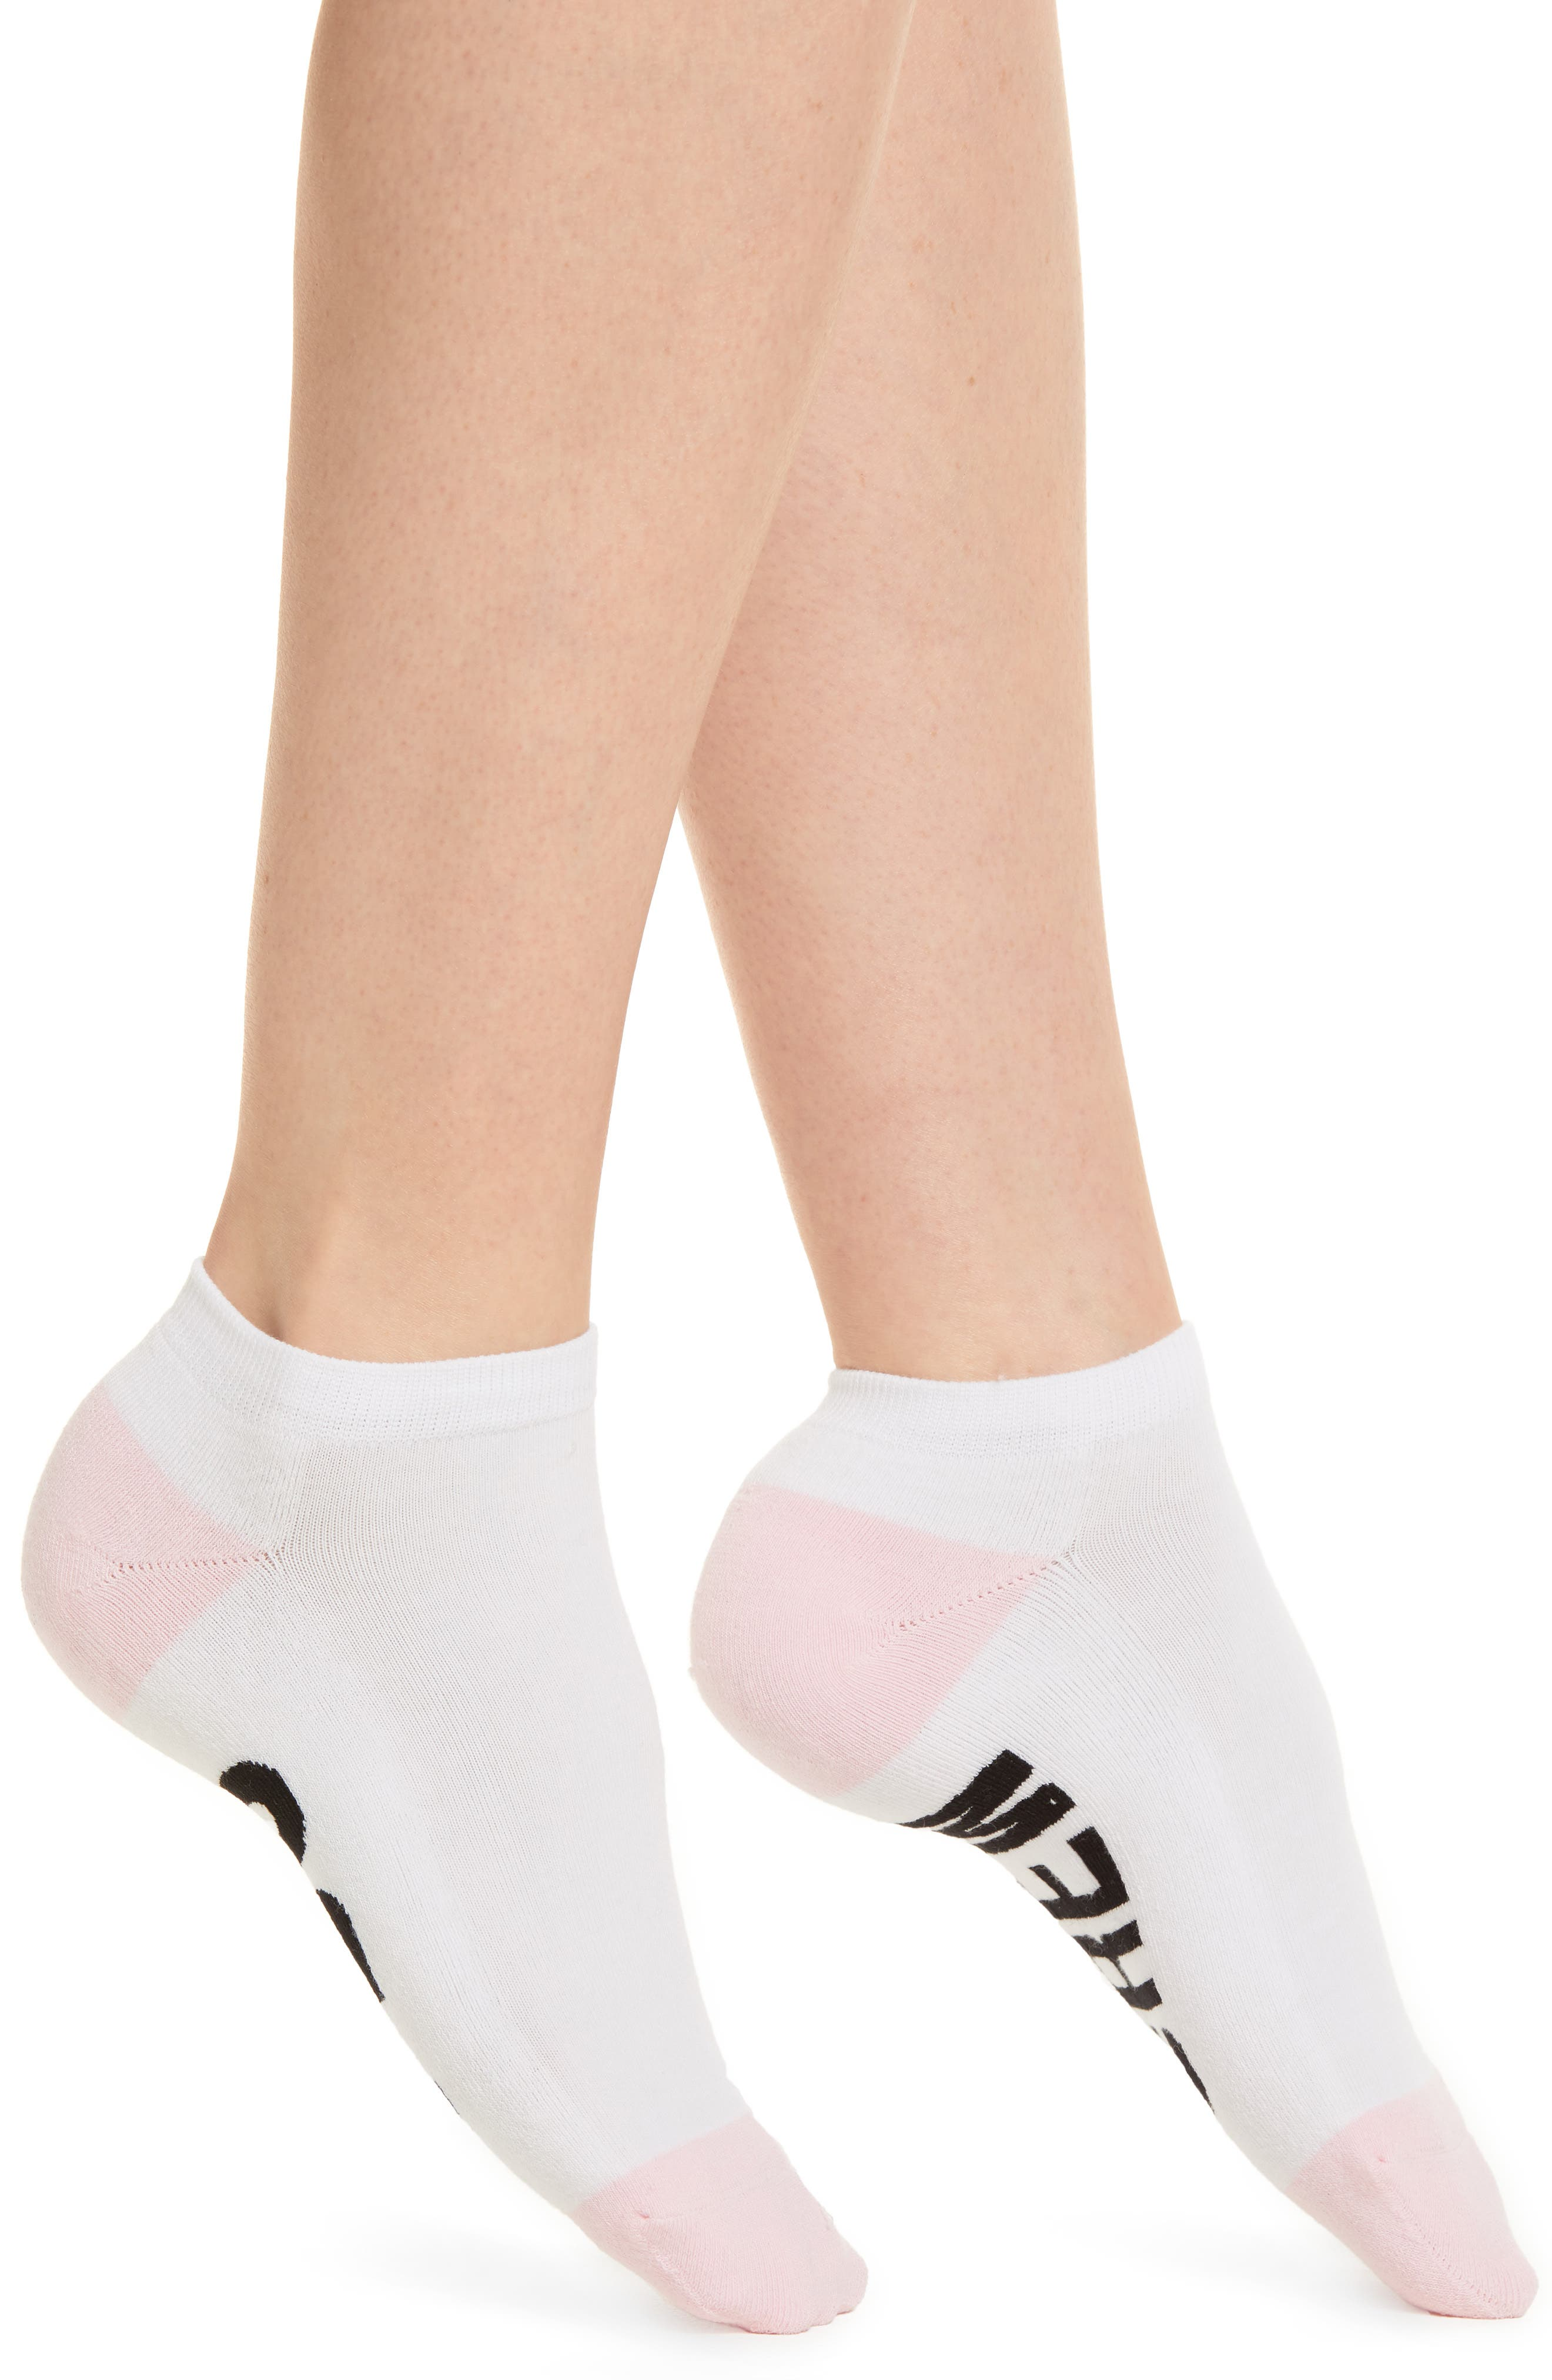 I Do Crew Low-Cut Socks,                         Main,                         color, White